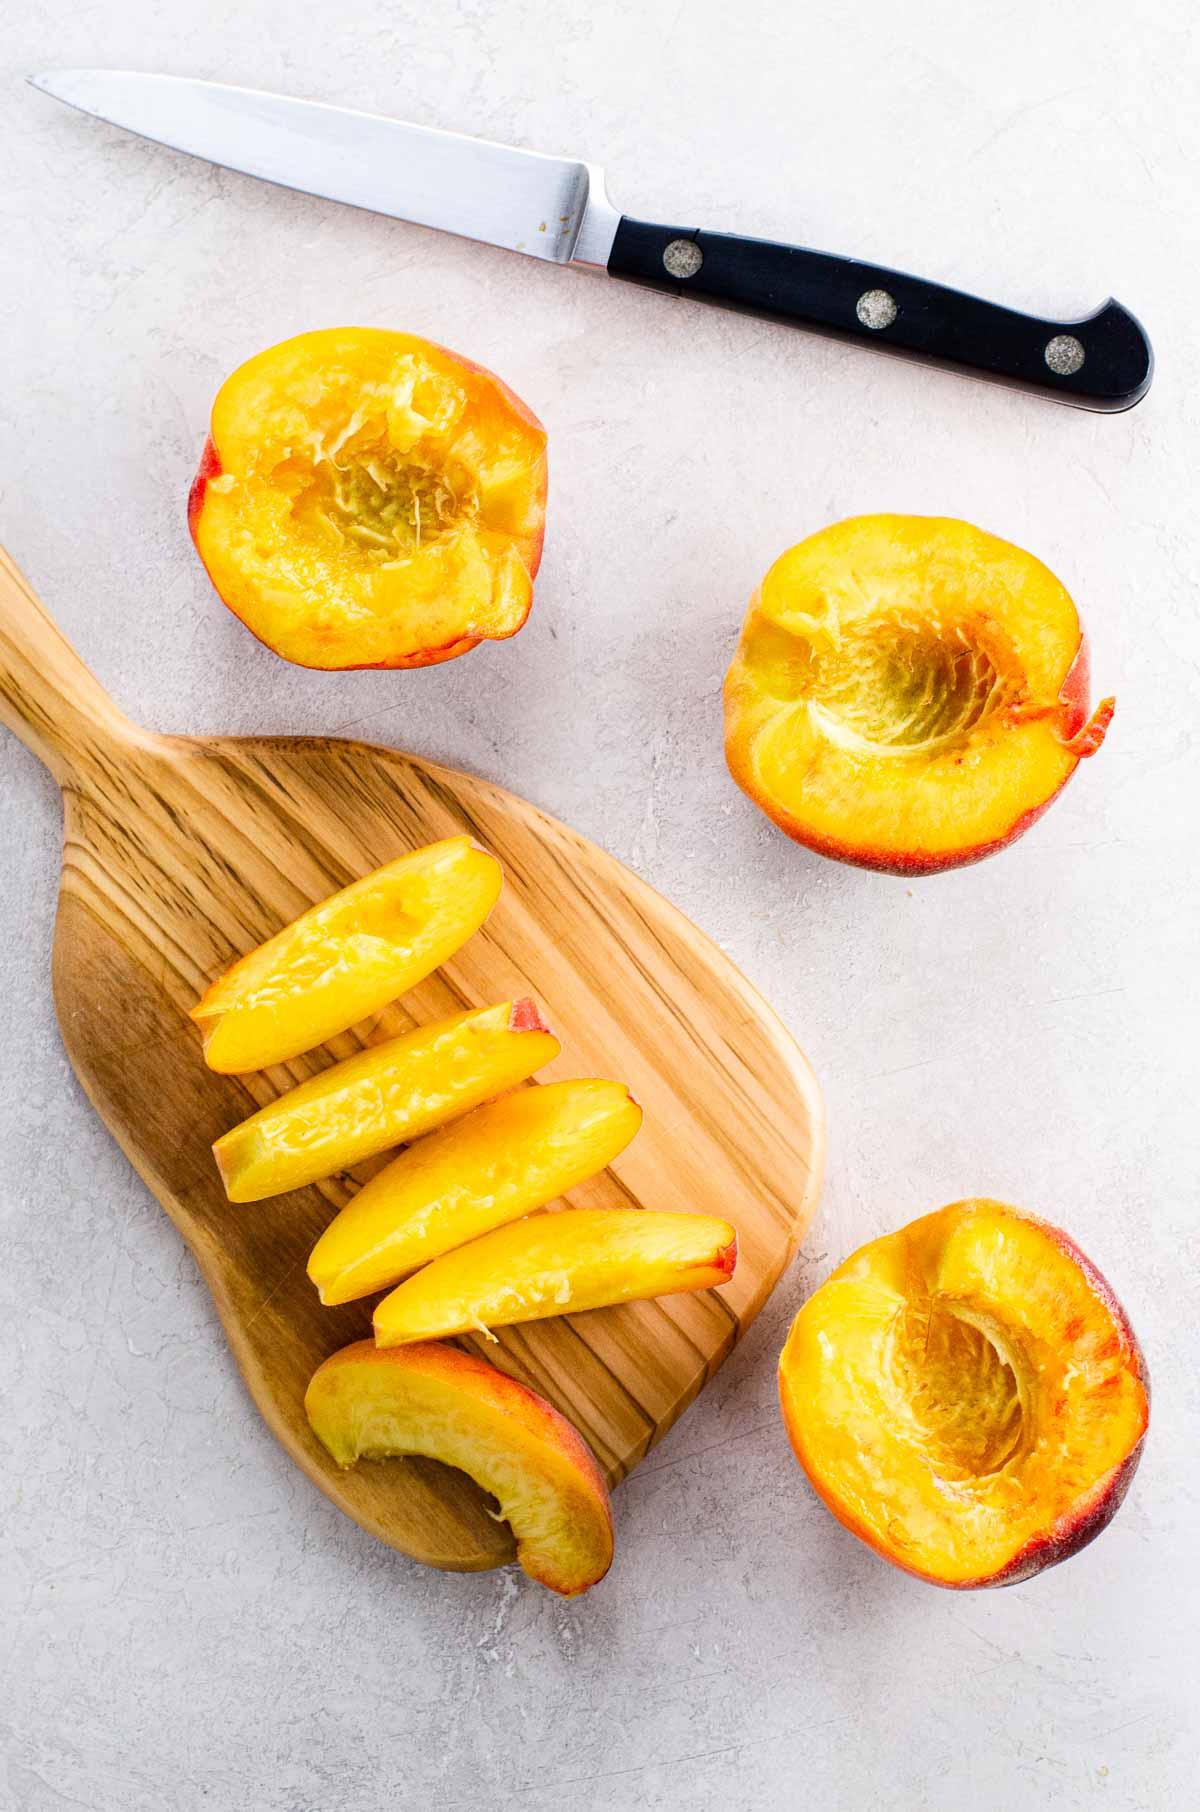 peach slices on a cutting board, peach halves, paring knife